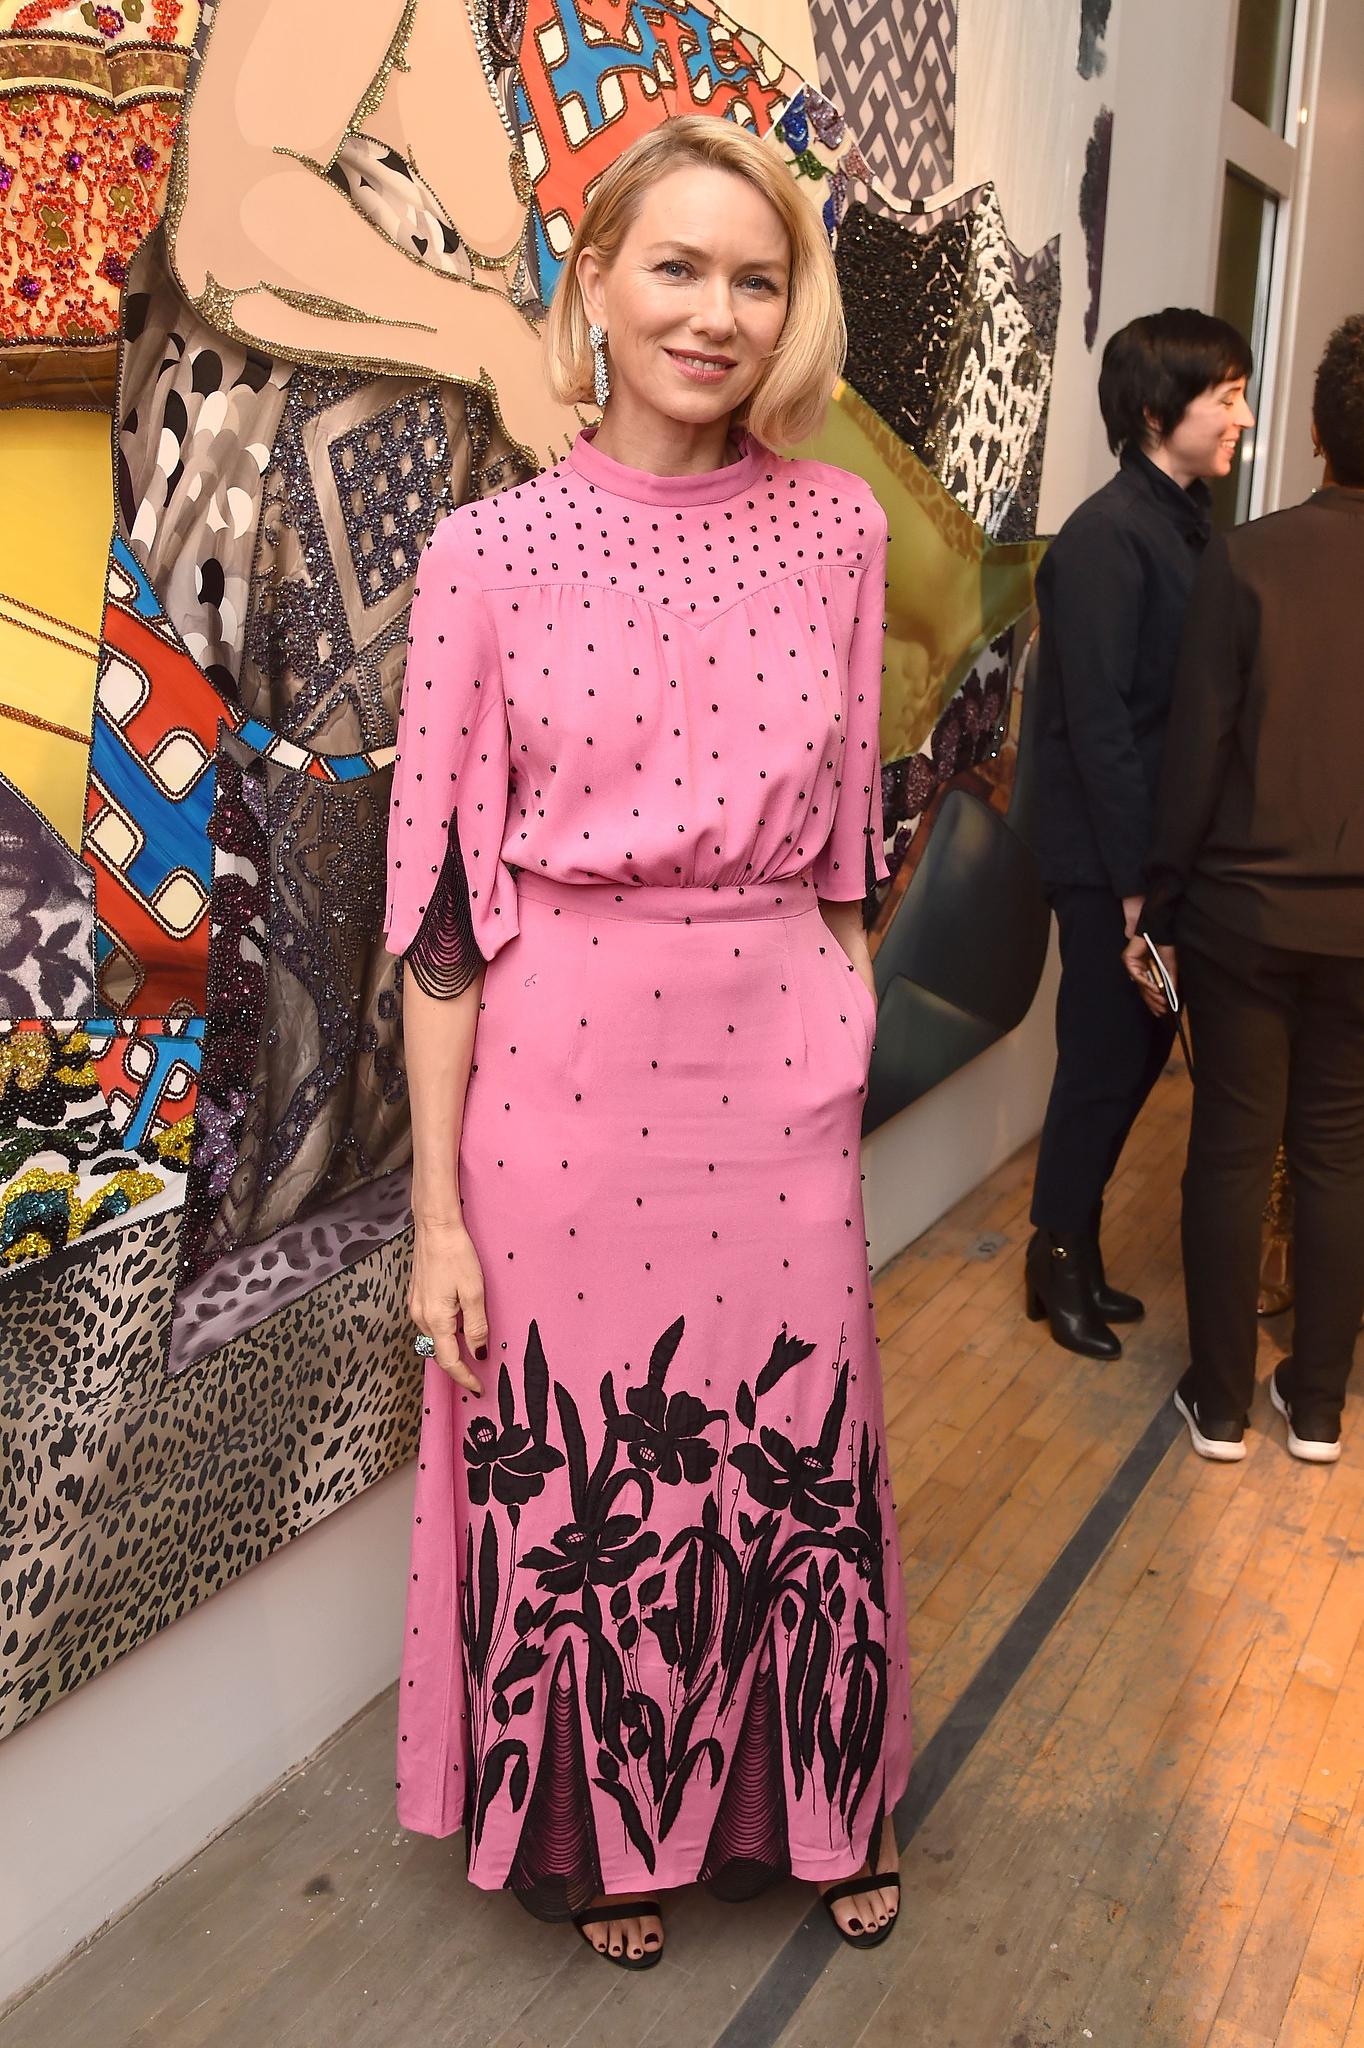 Naomi WattsTribeca Ball, New York, USA - 09 Apr 2018WEARING ATTICO